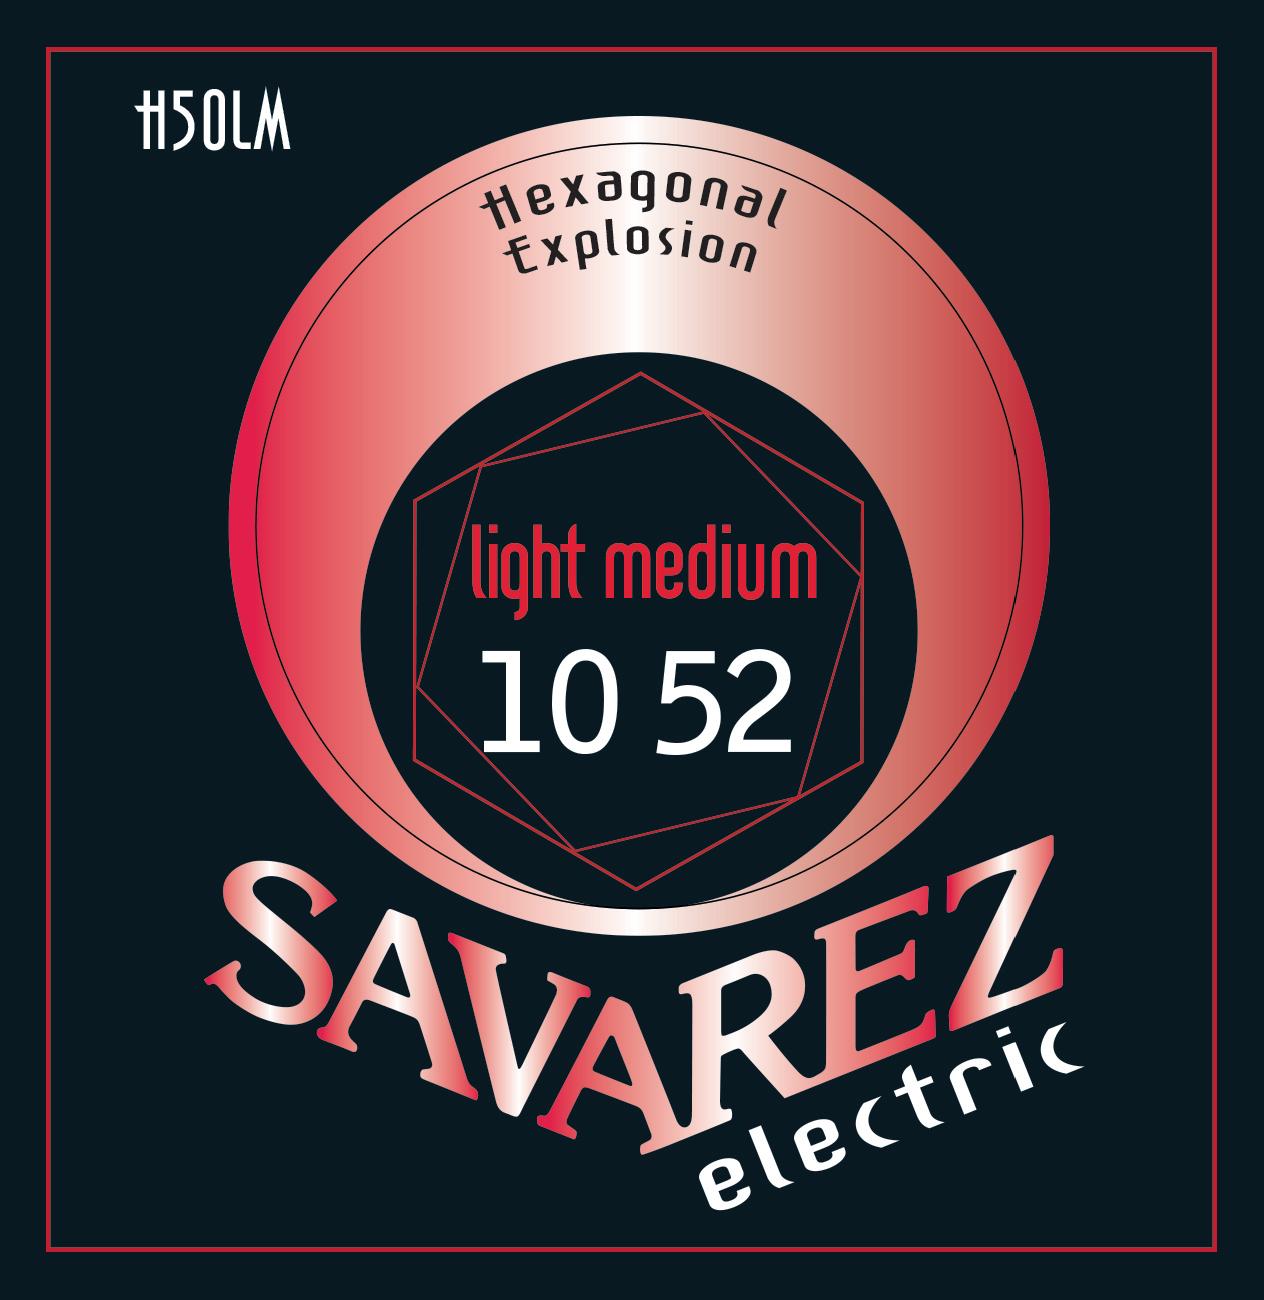 SAVAREZ ELECTRIC HEXAGONAL EXPLOSION H50LM